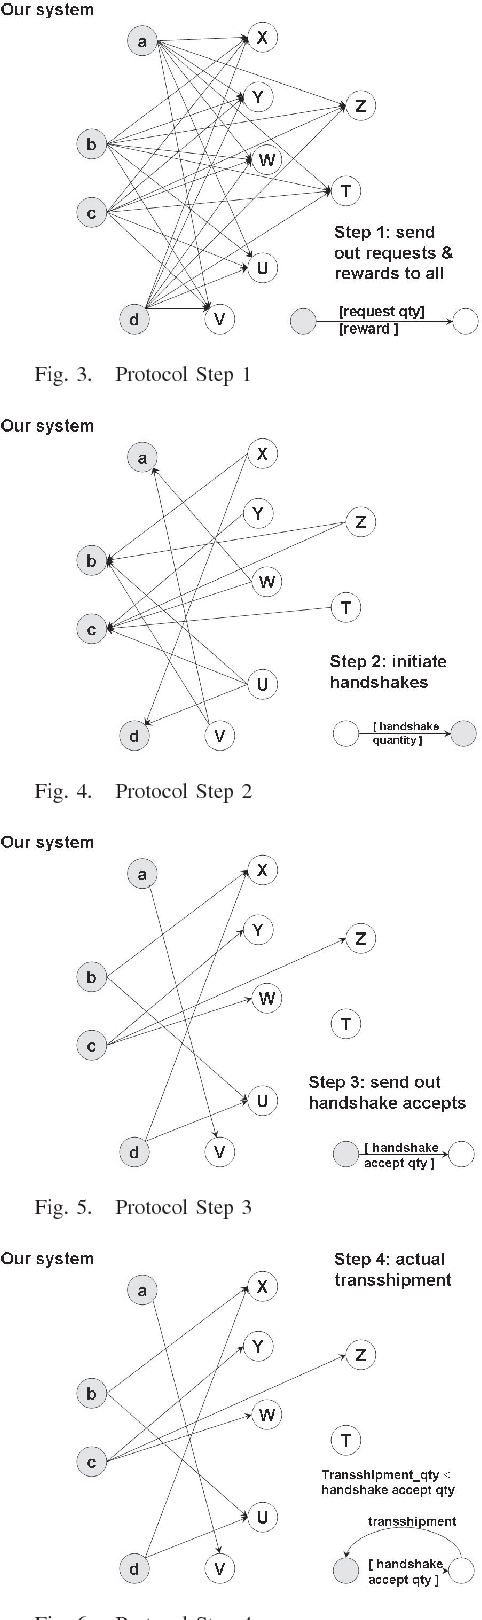 Fig. 4. Protocol Step 2